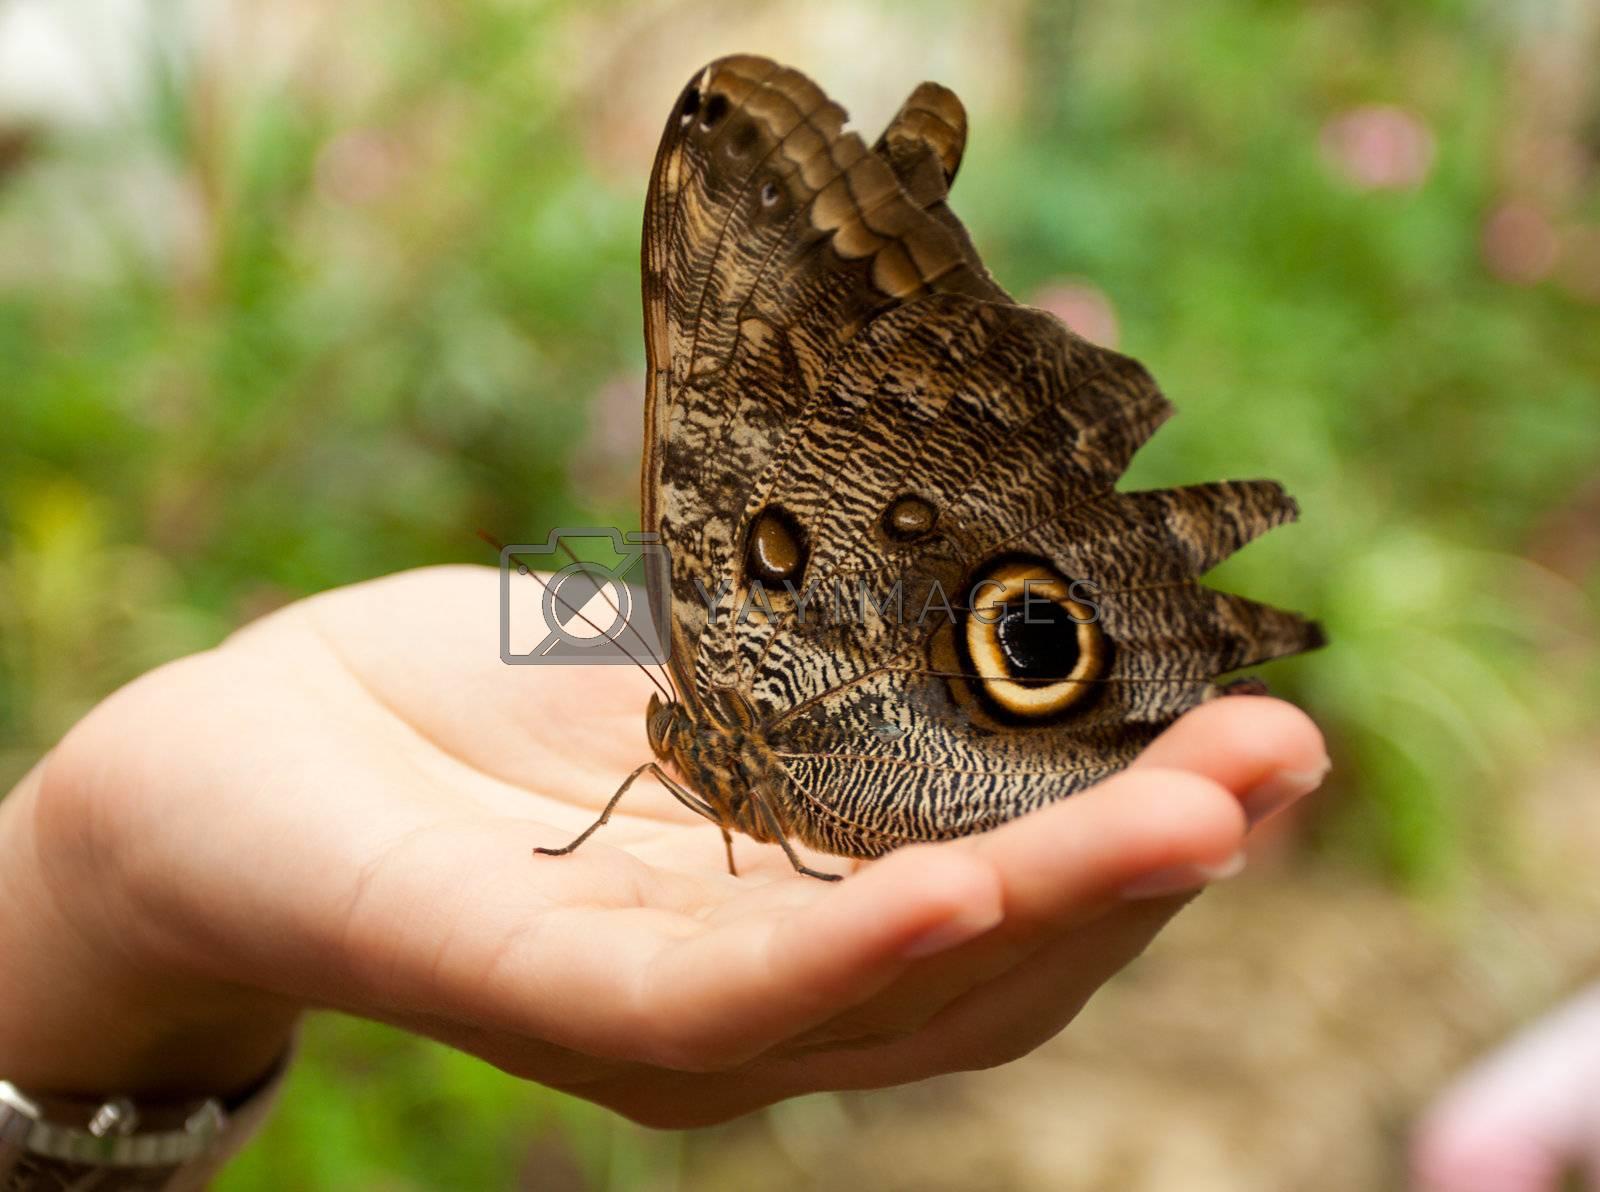 caligo memnon butterfly sitting on woman hand